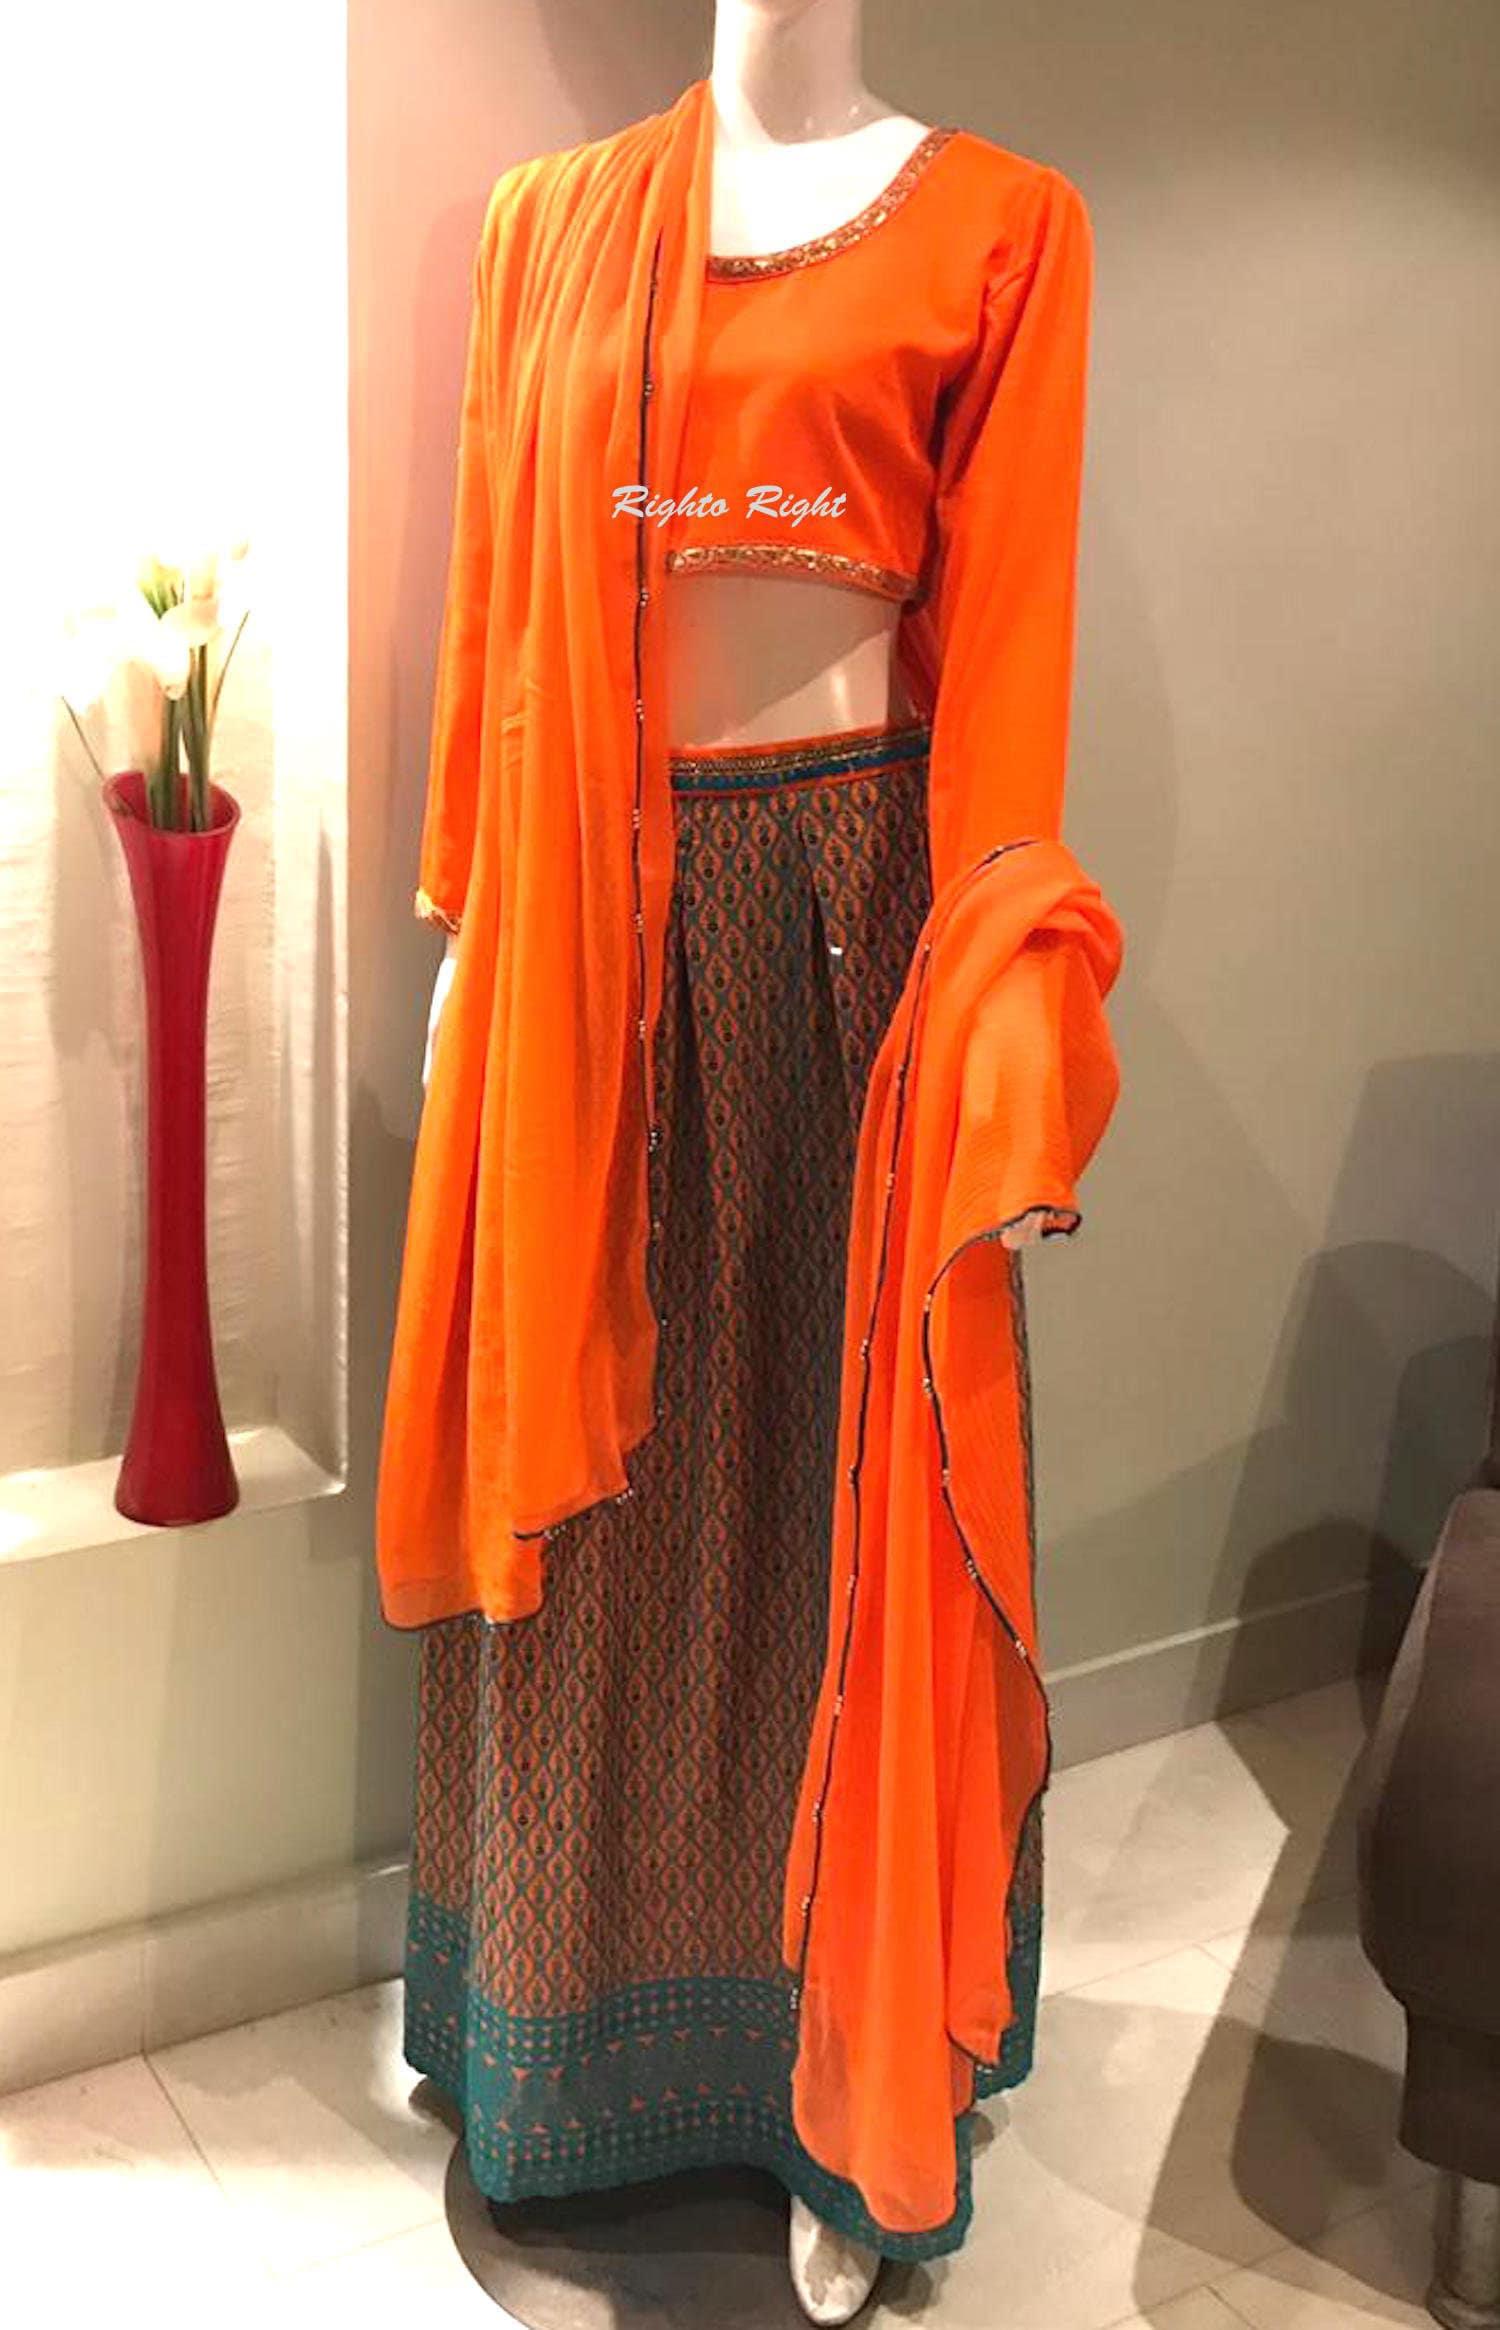 087be60336 Pakistani Lehenga / Indian Wedding Dress / Skirt Blouse / Ready to Ship